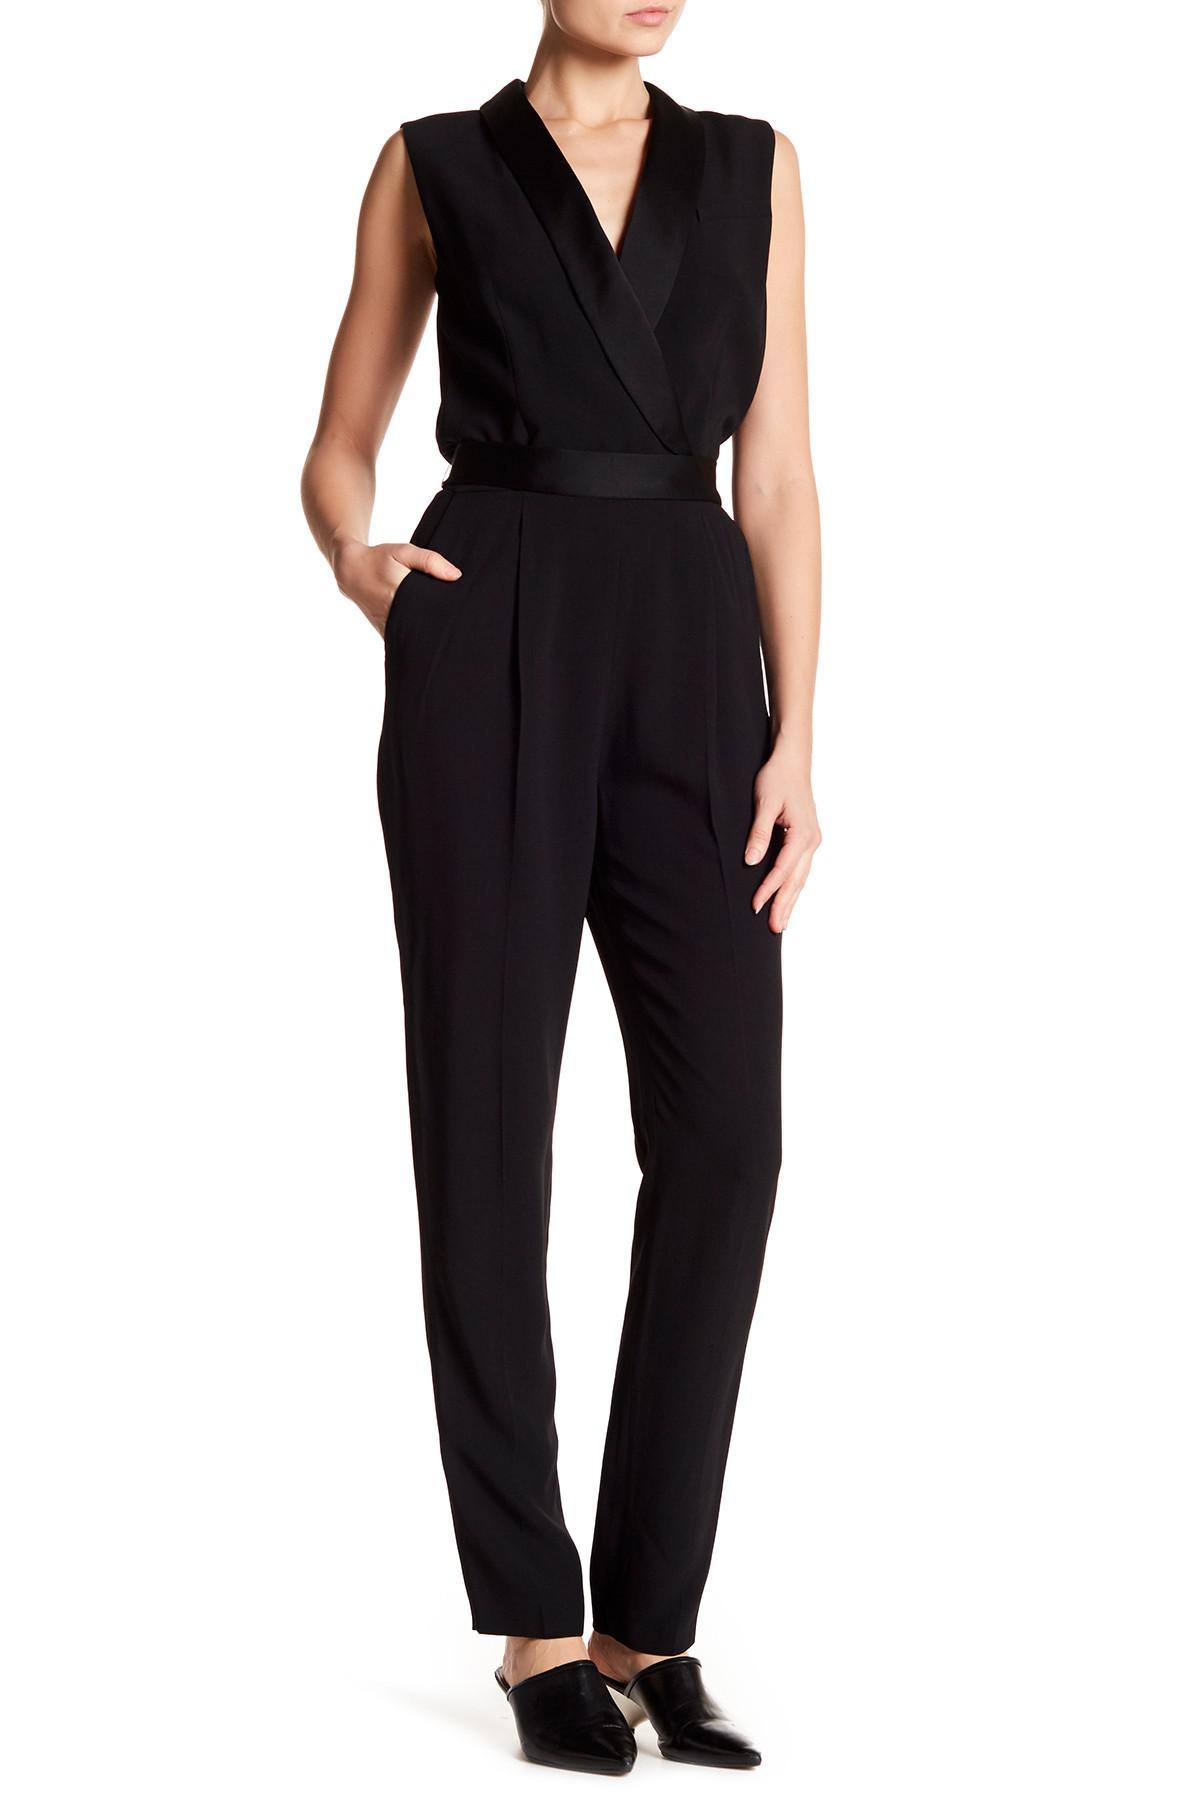 5bae734bcfd Lyst - BOSS Duxida Sleeveless Tuxedo Jumpsuit in Black